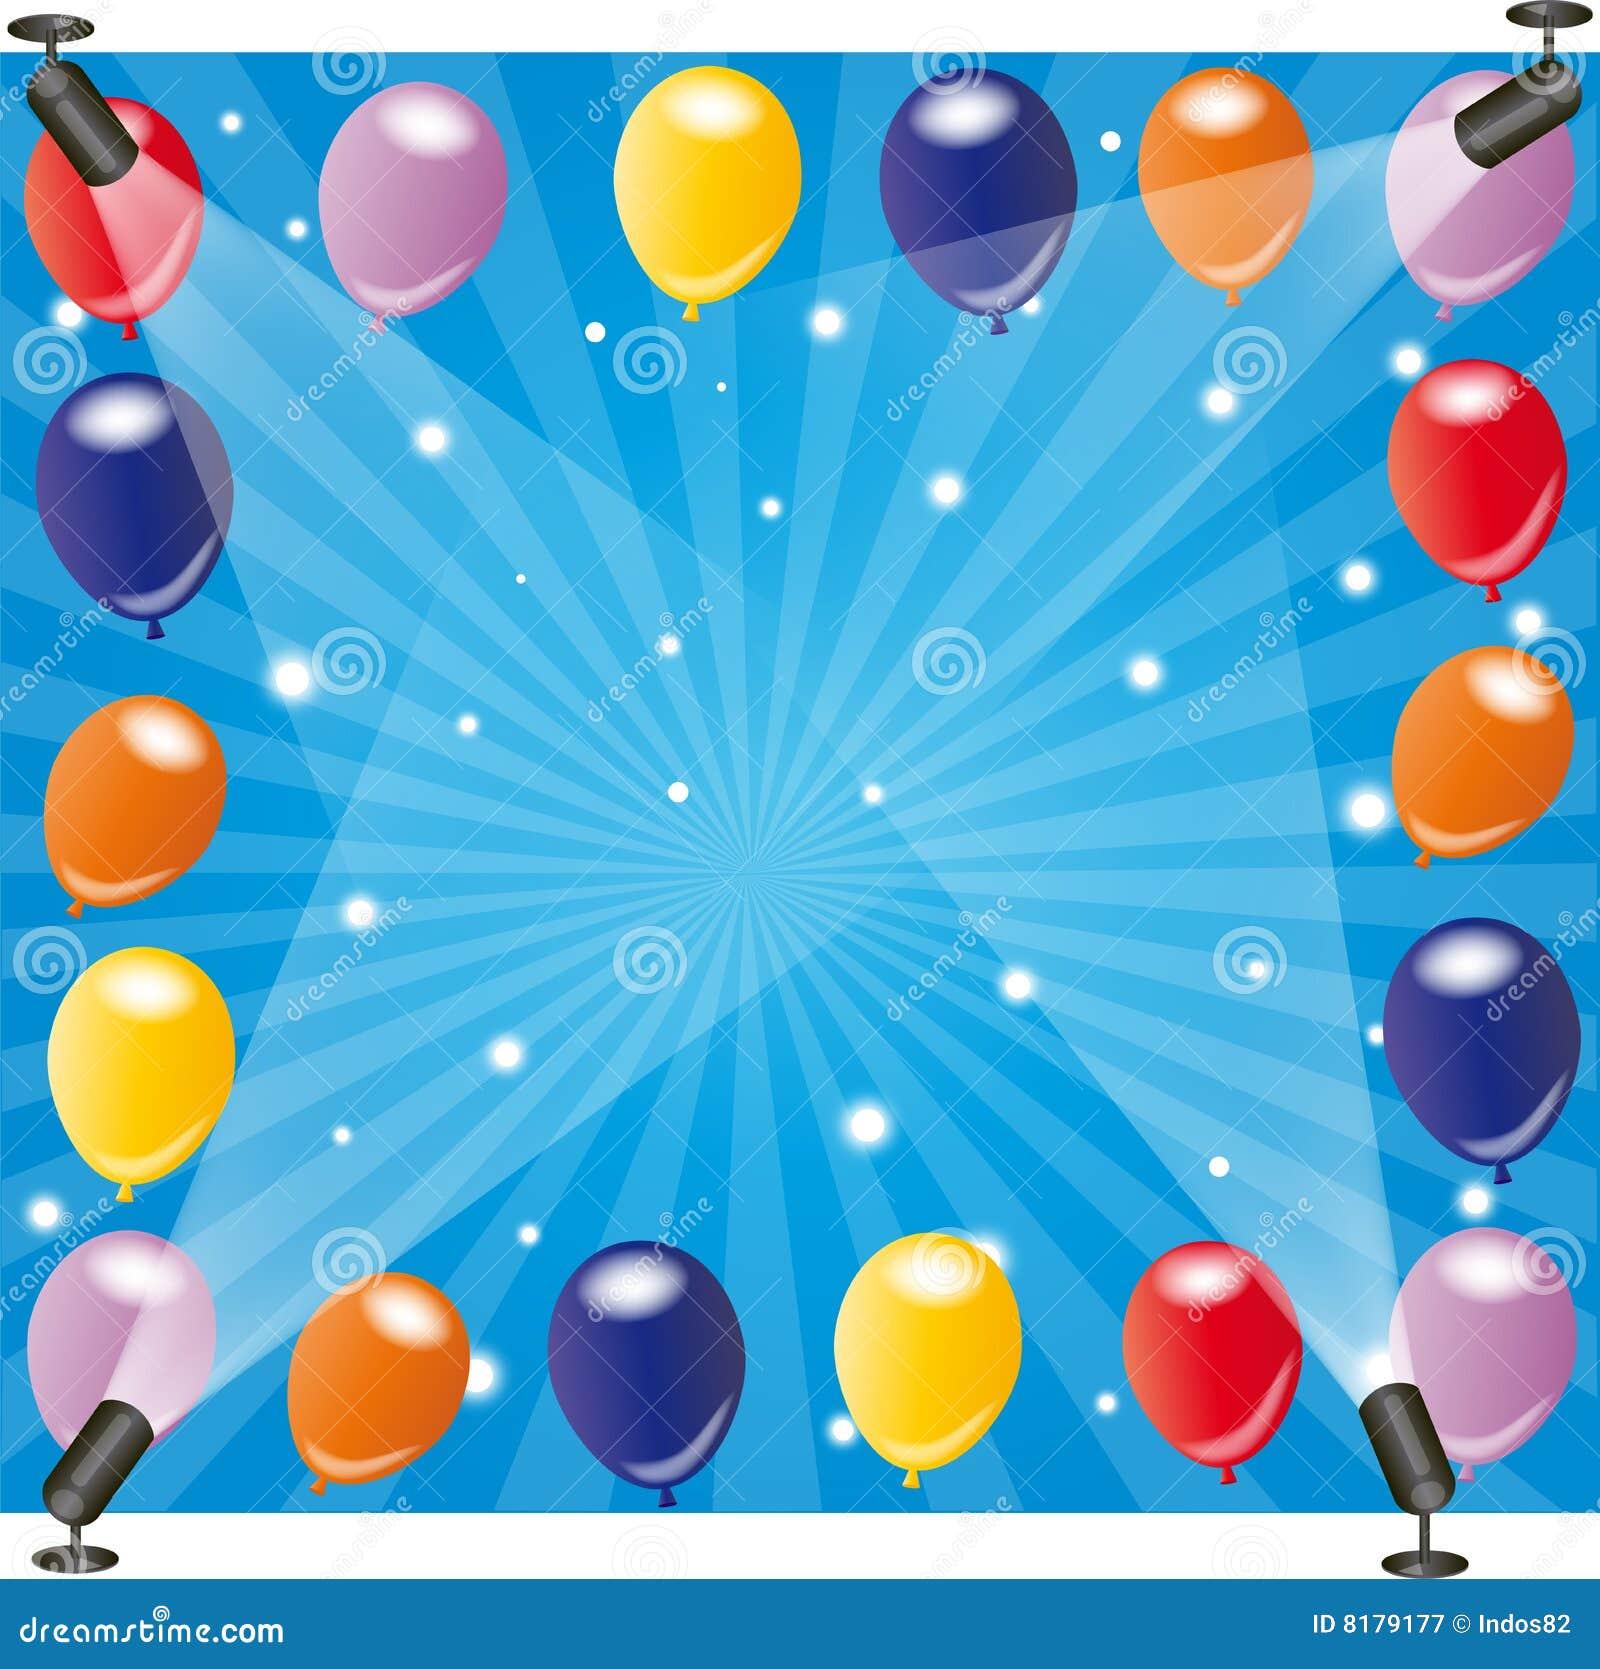 balloon frame with spotlights